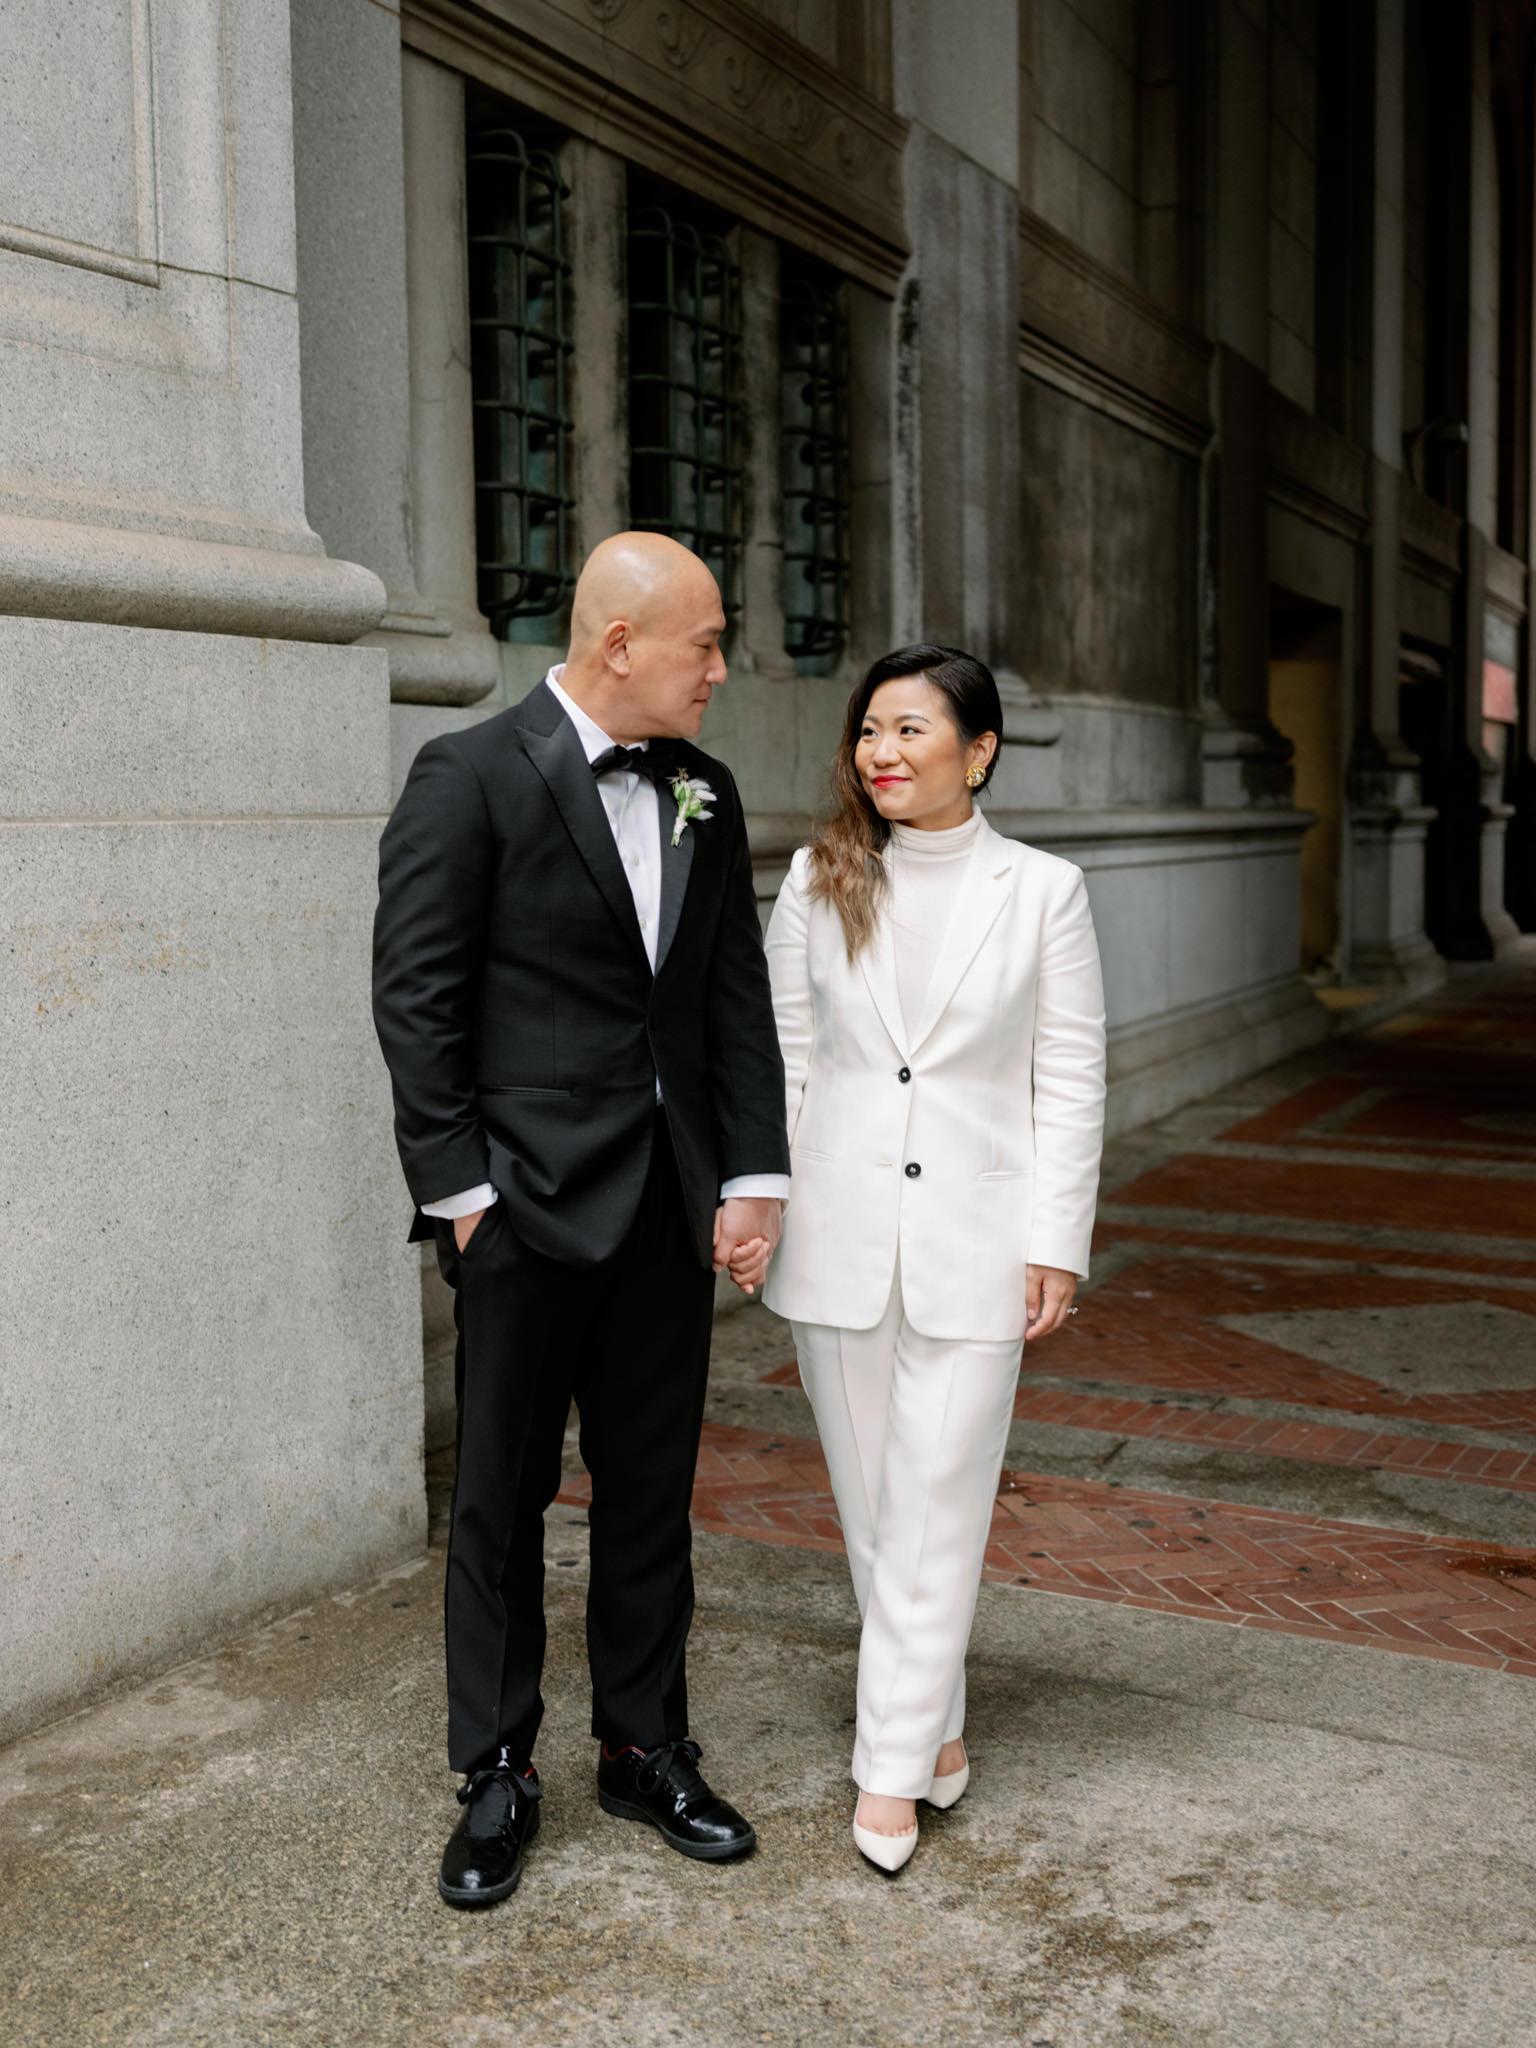 wedding suit for bride